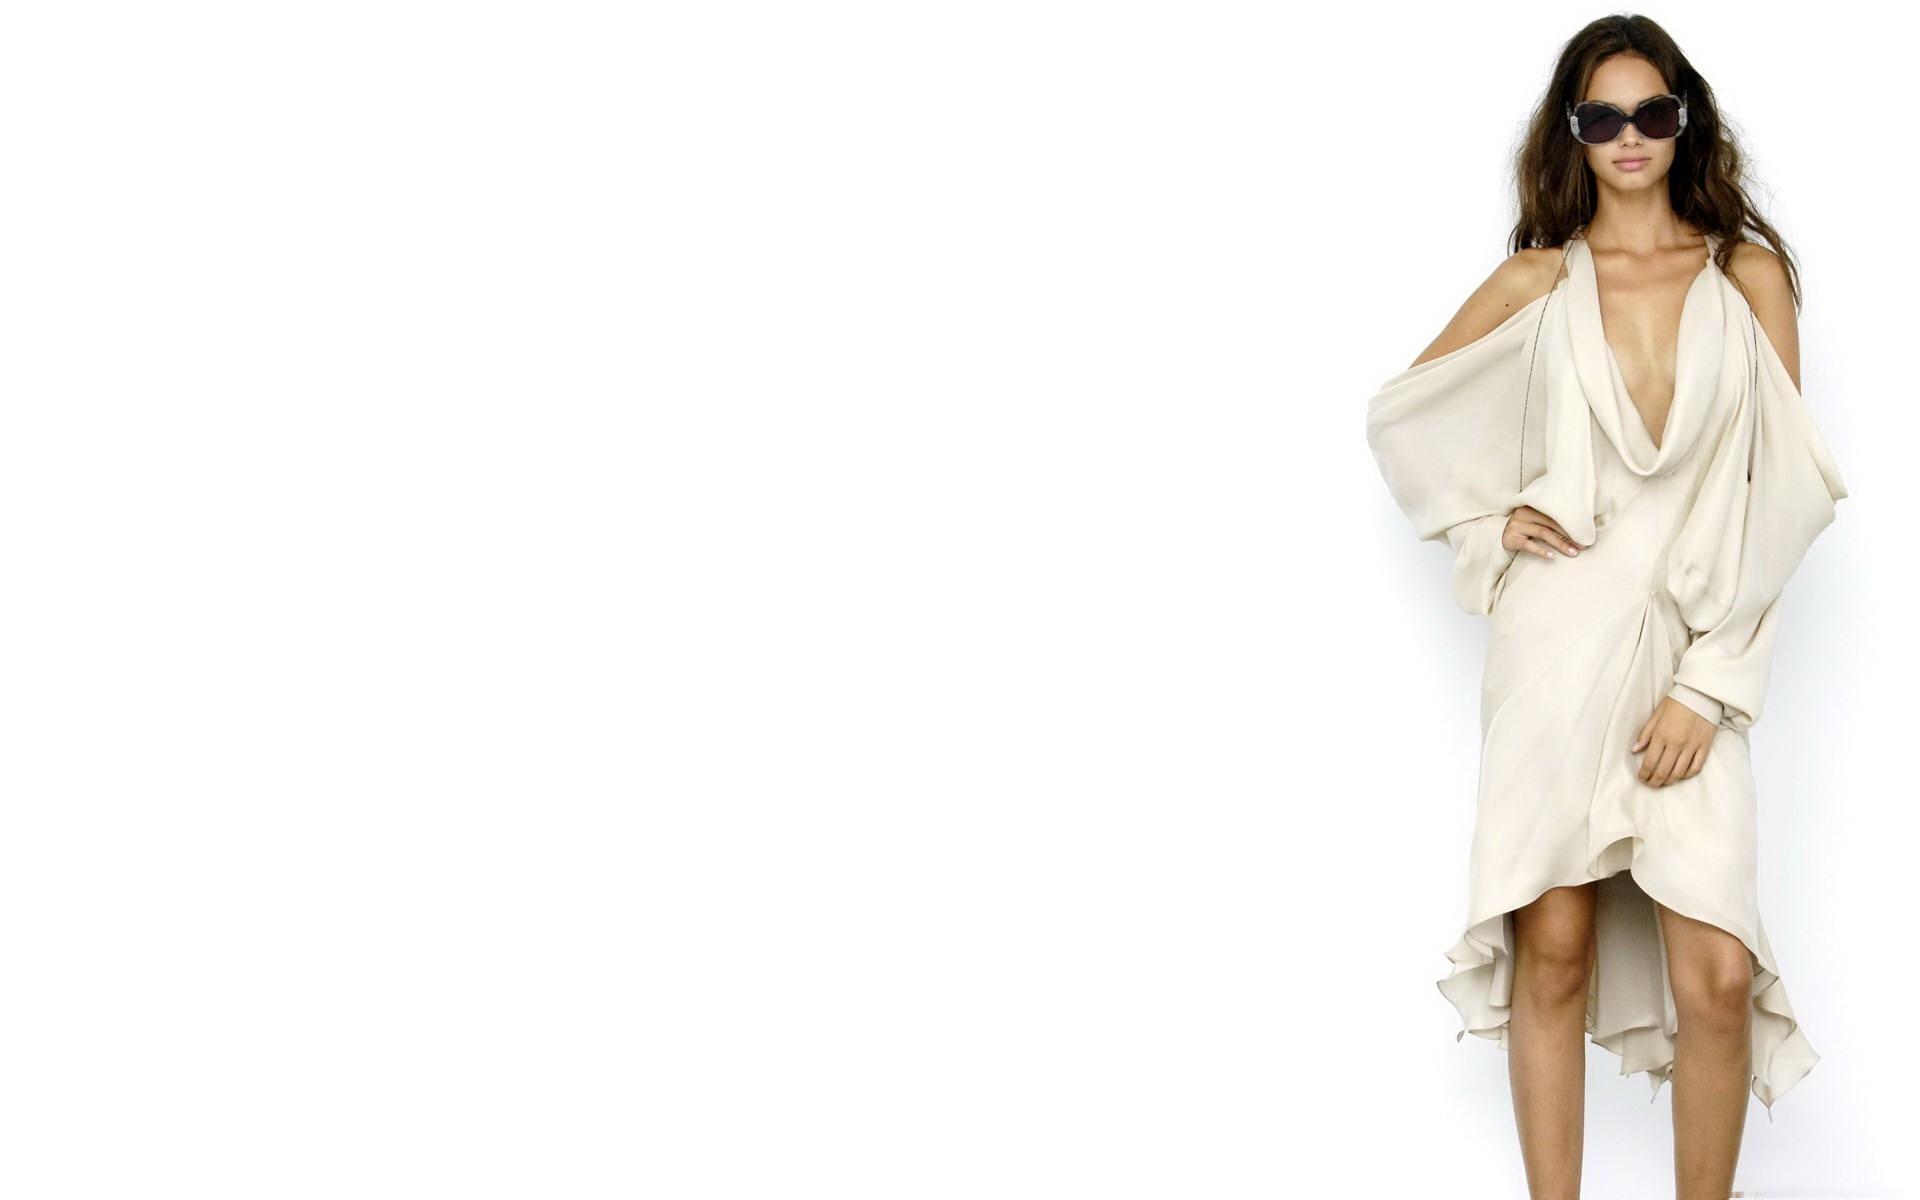 Brunette, Dress, Model Wallpaper, HD Girls 4K Wallpapers